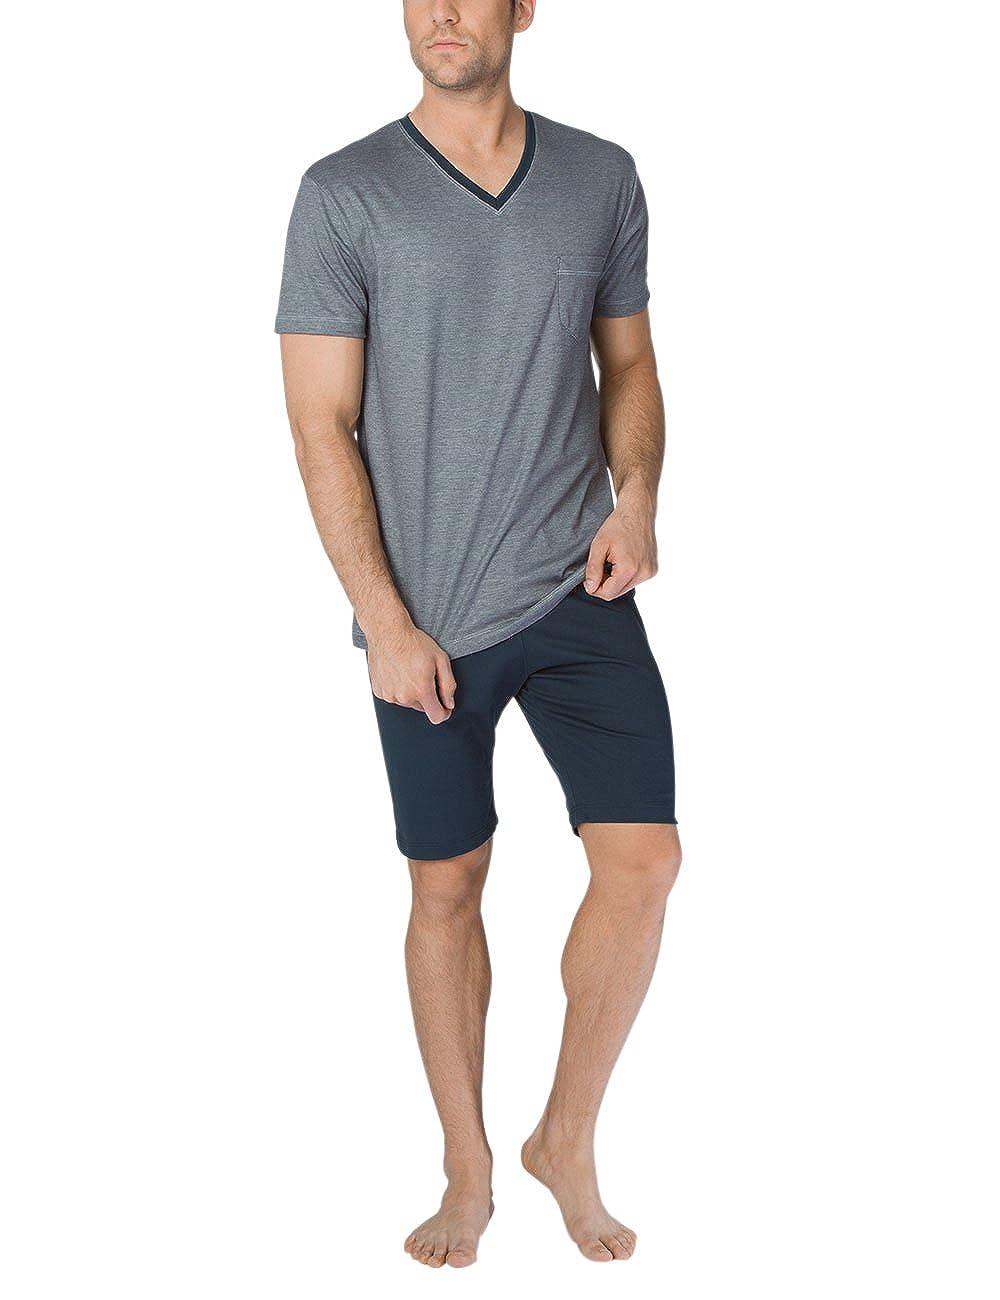 48365 Calida Comfy Zone Micro Modal Pajama Short Set